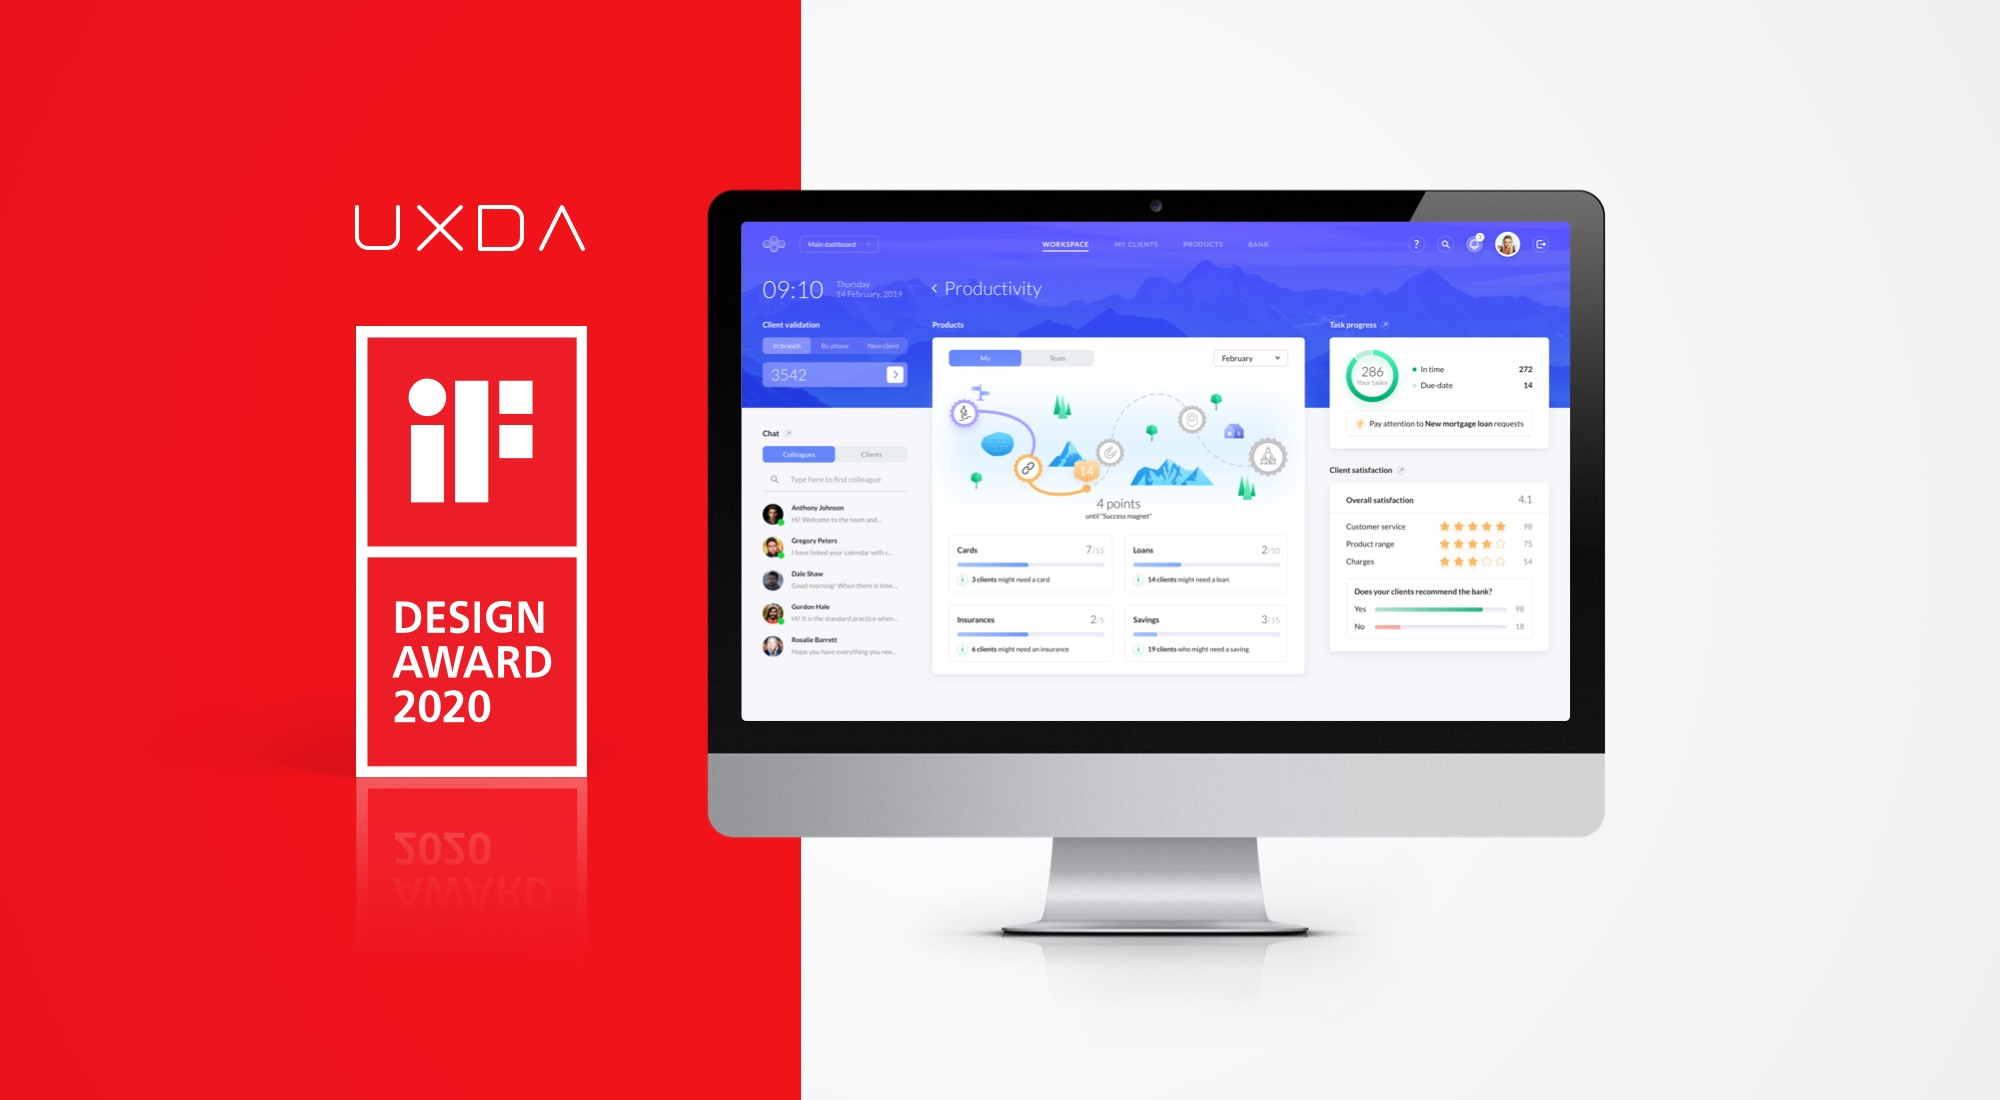 uxda-core-banking-ux-wins-if-award-hero-blog-2000-1__2000-1607492129.jpg